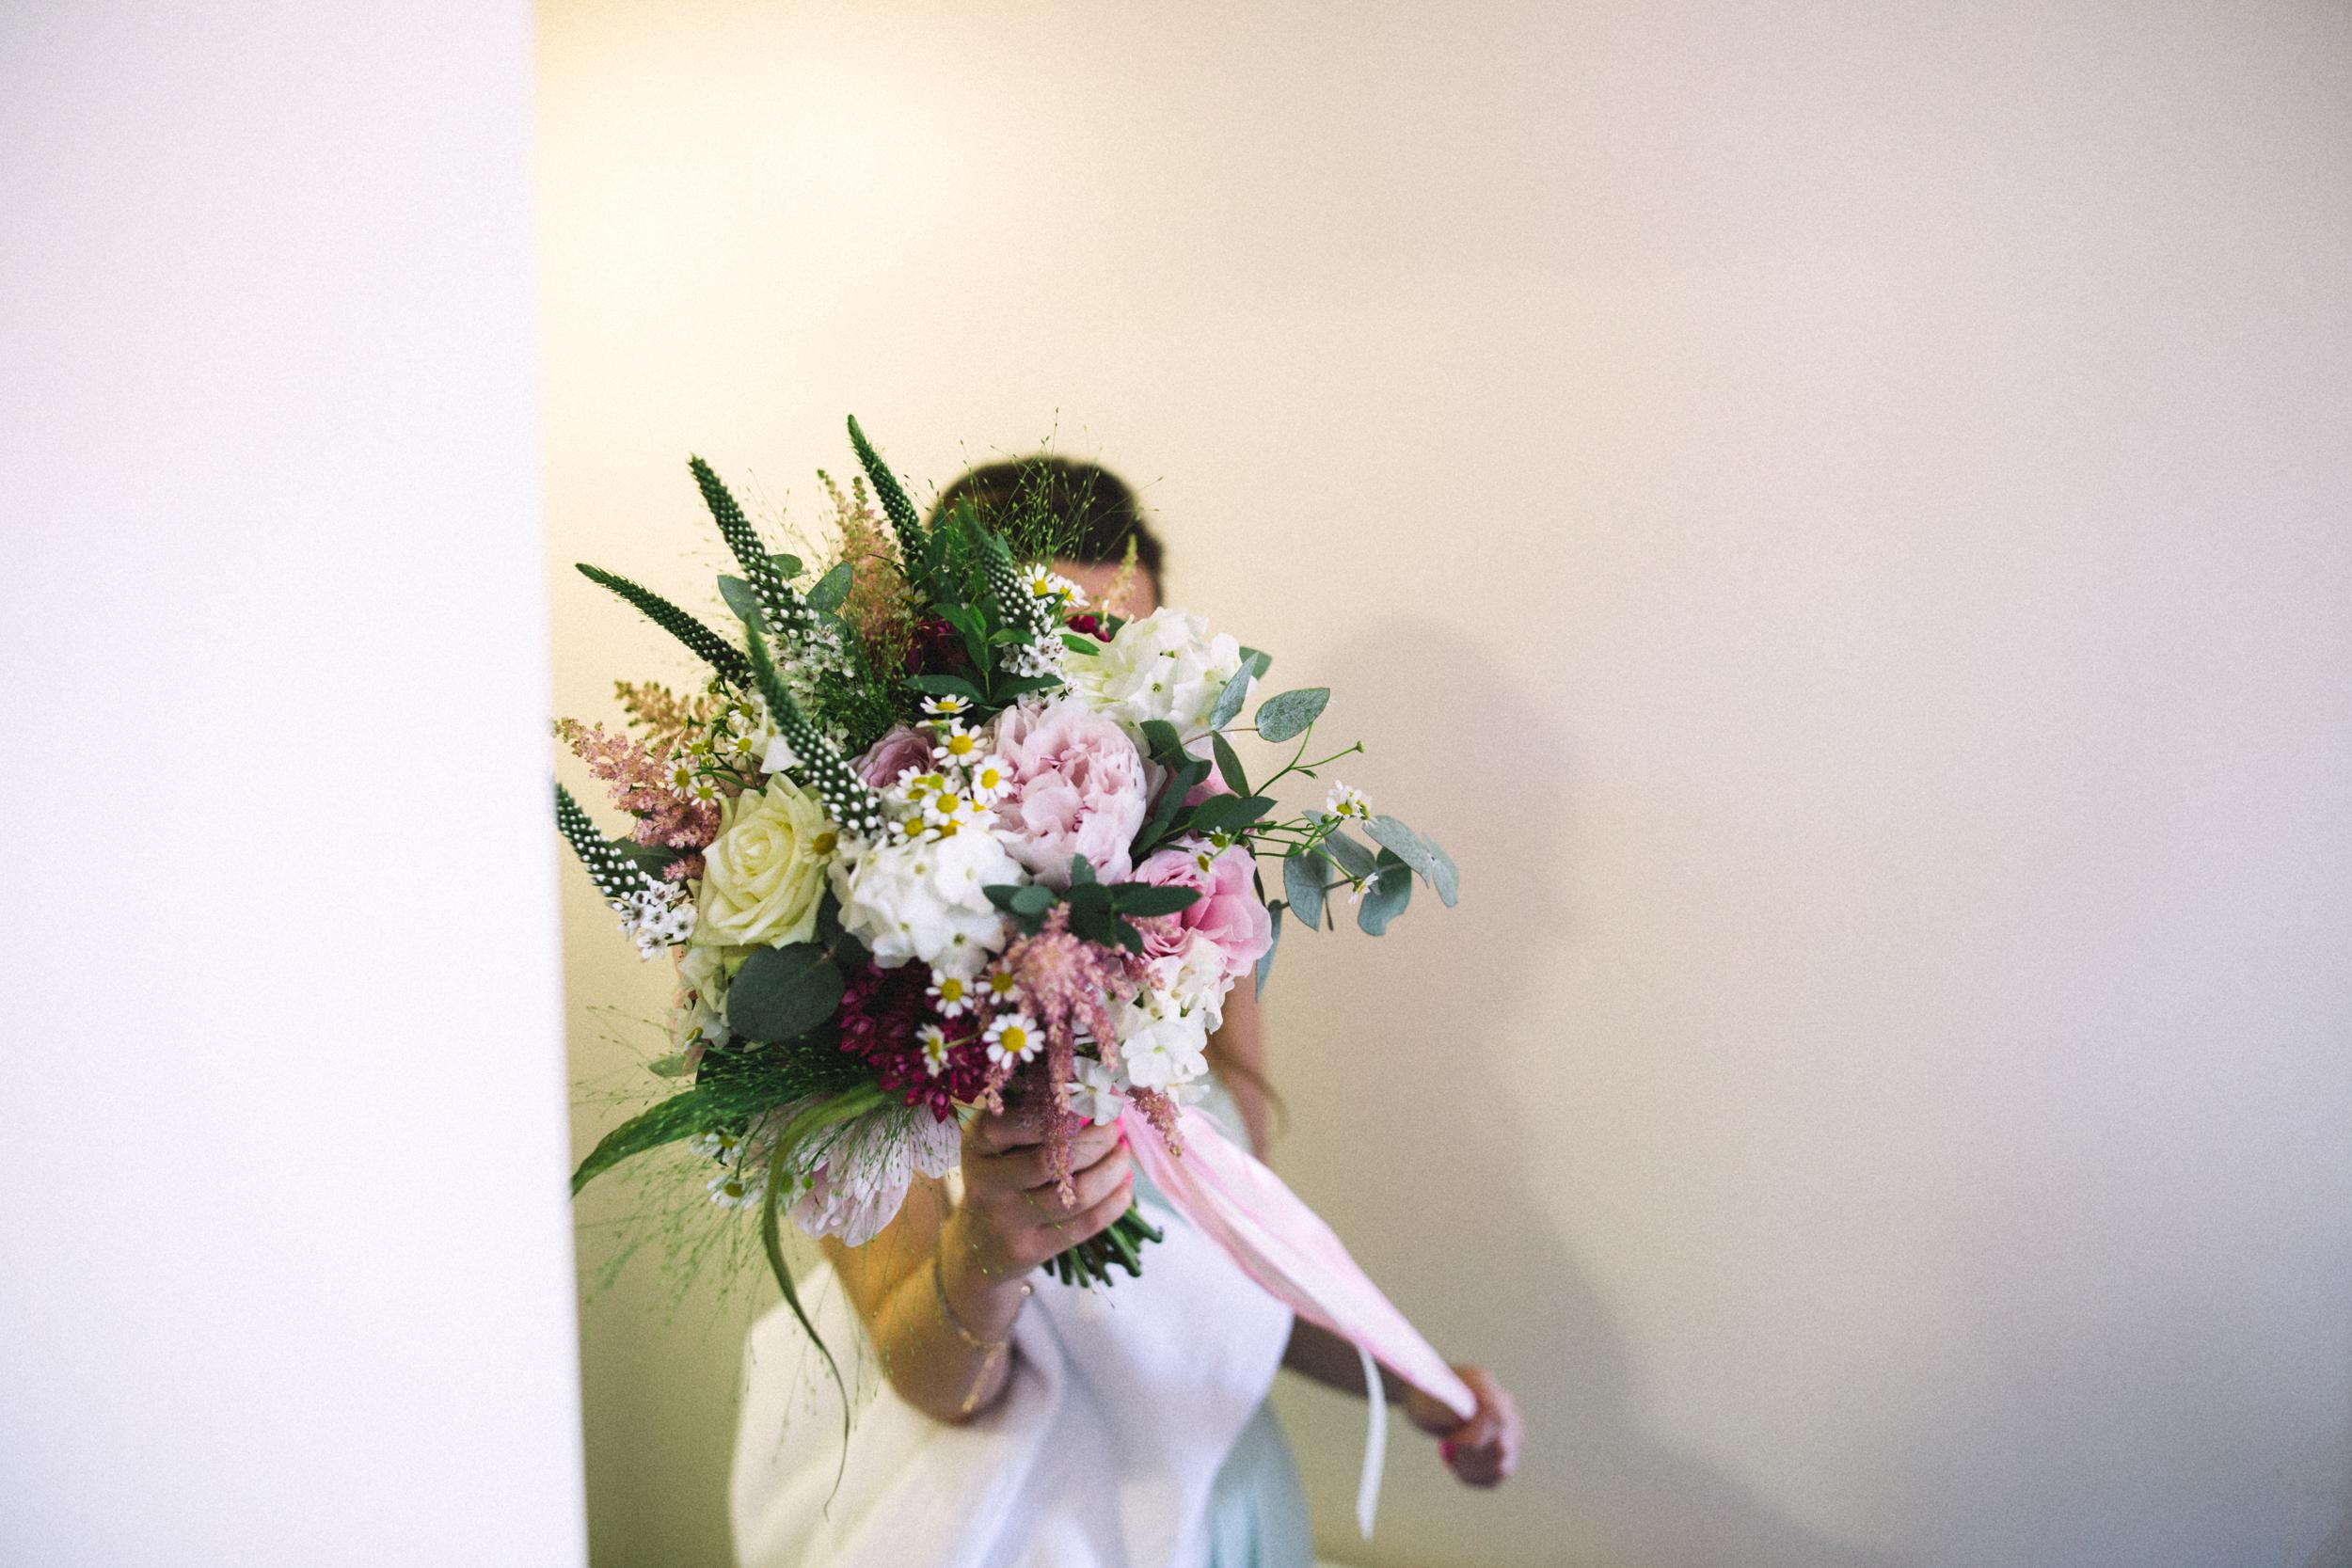 creative-wedding-photography-teesside-north-east-yorkshire-1.jpg